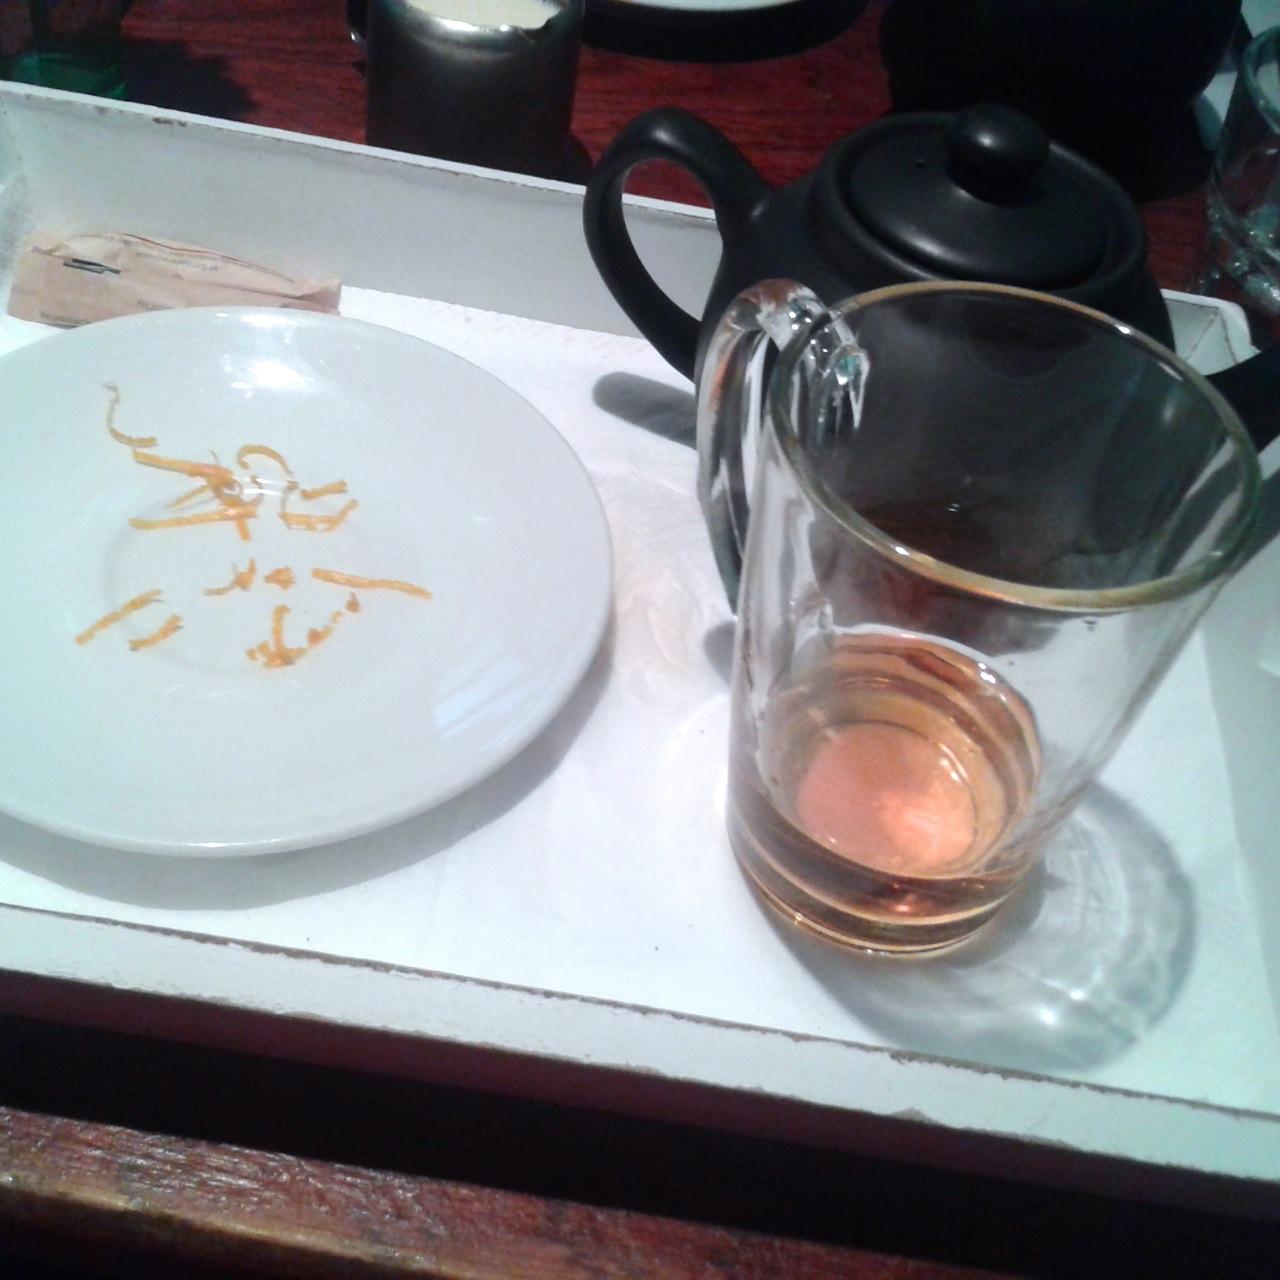 http://i1.wp.com/fatgayvegan.com/wp-content/uploads/2014/12/smoked-whisky.jpg?fit=1280%2C1280